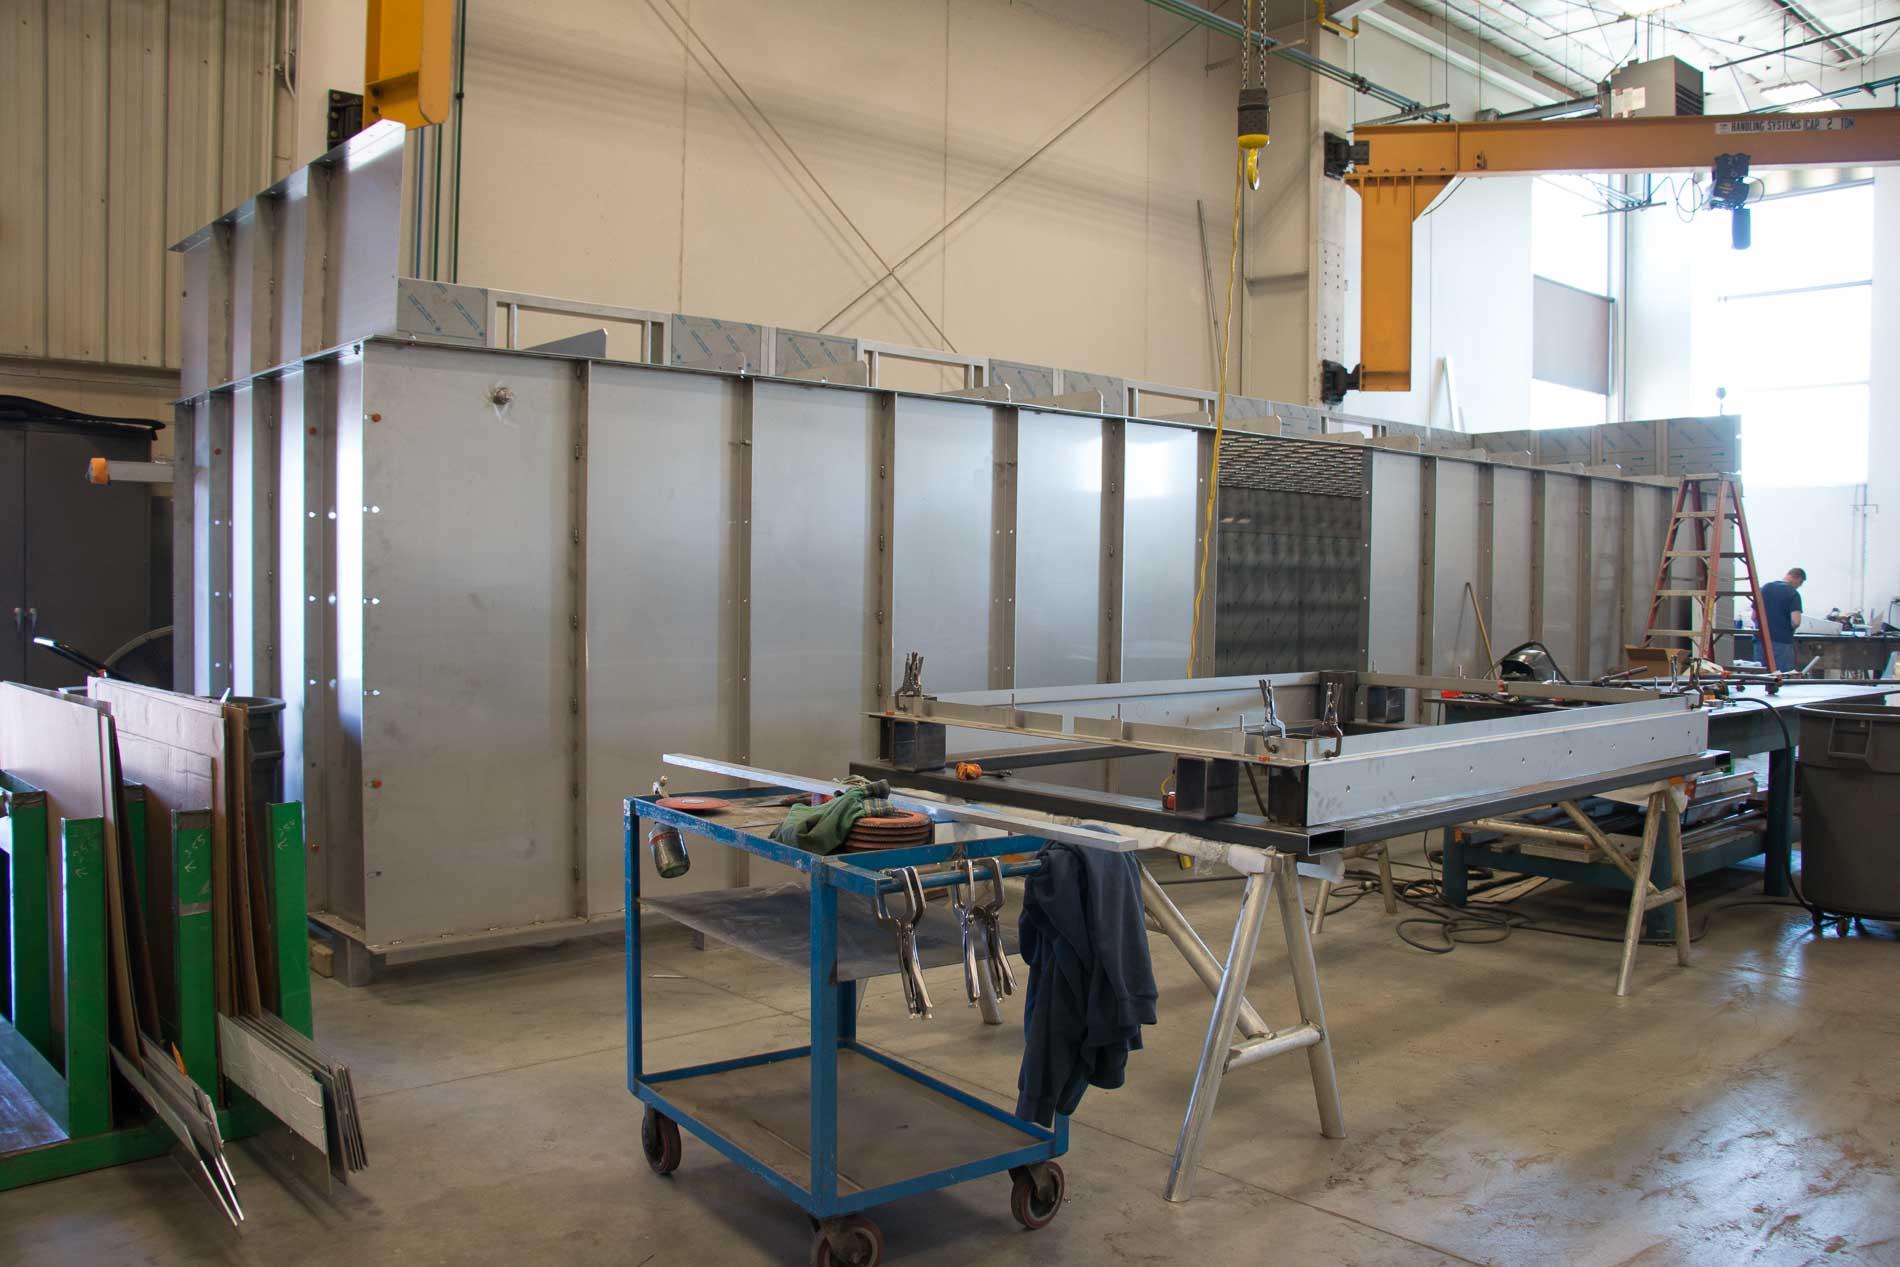 Metal fabrication from Badger Sheet Metal Works